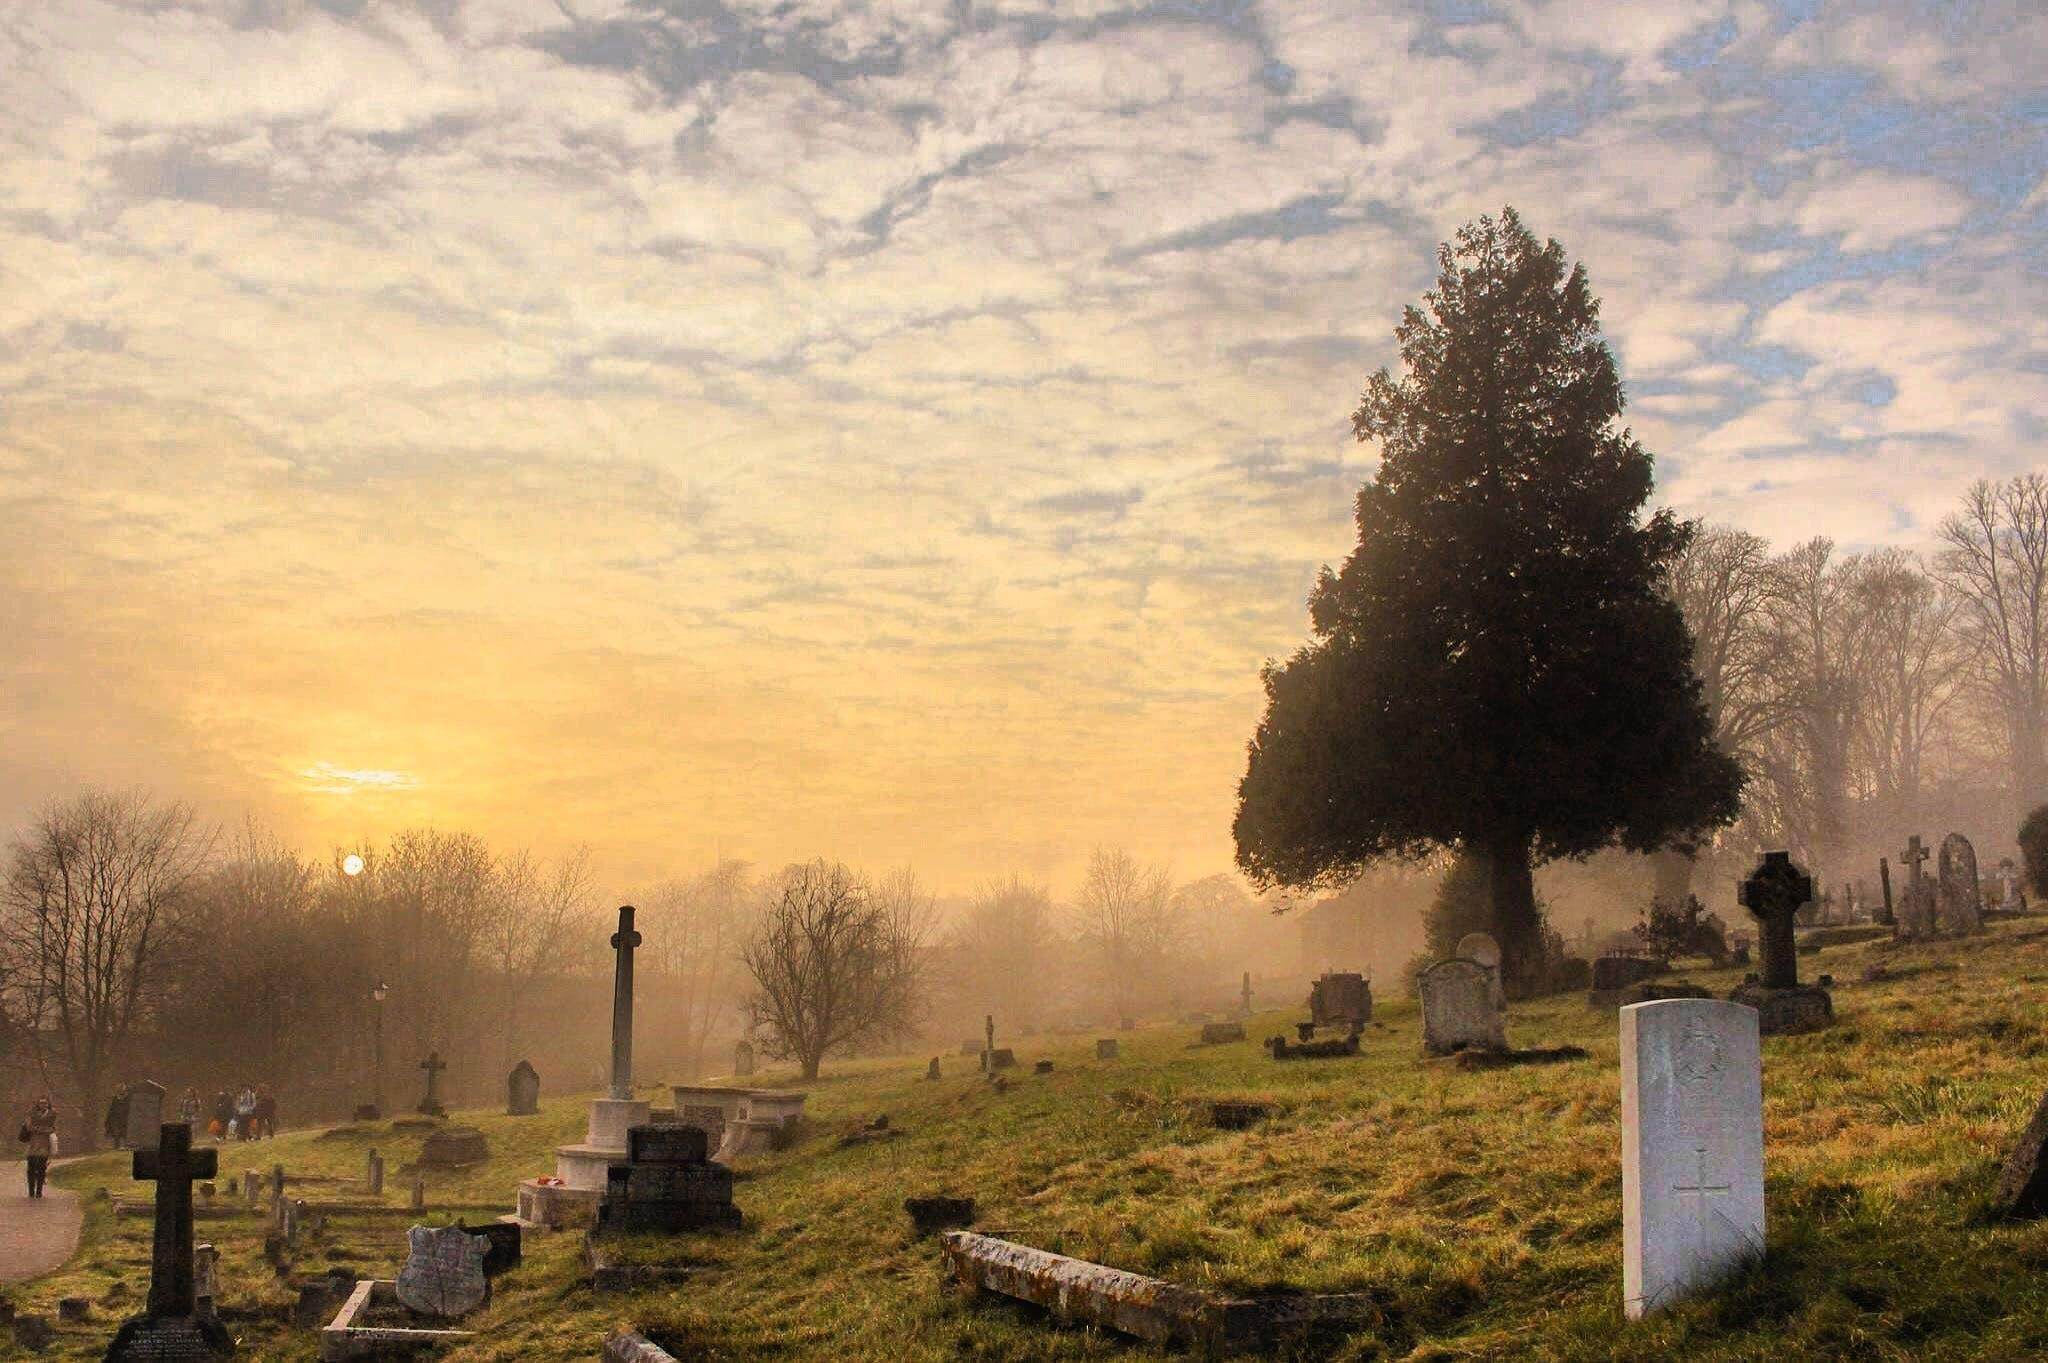 Cemetery Under the Cloudy Sky